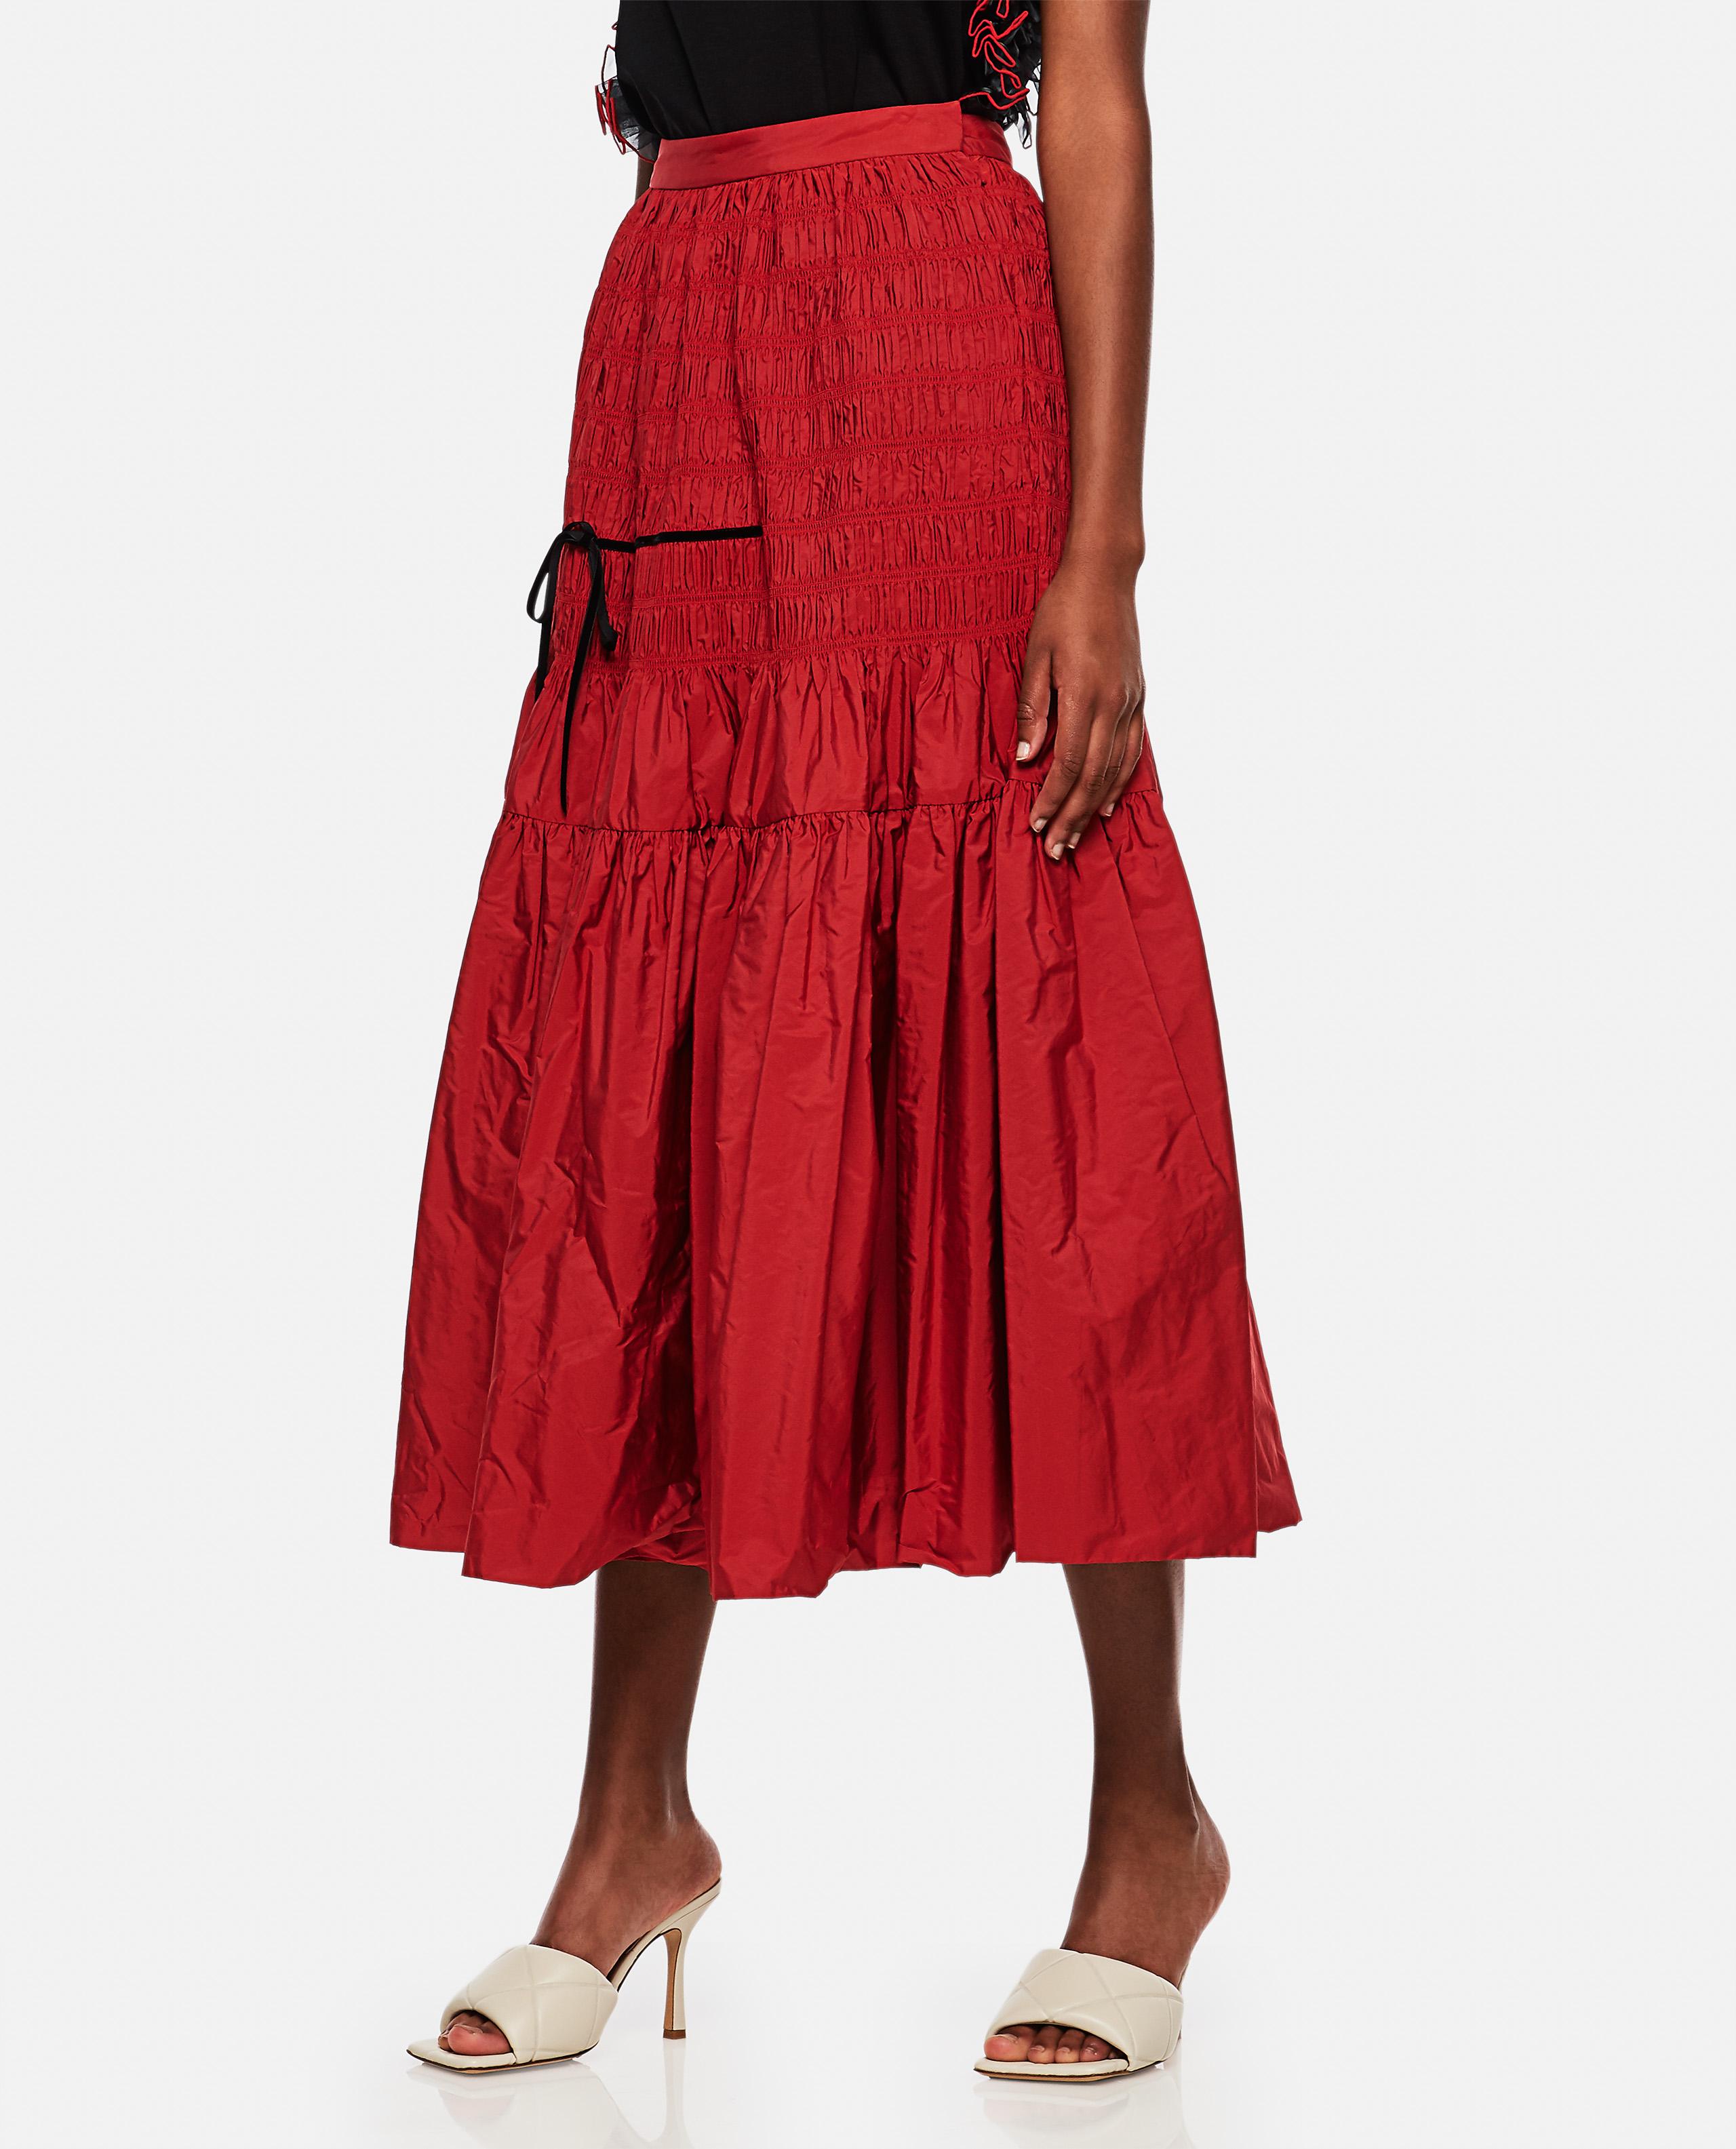 Donnika skirt